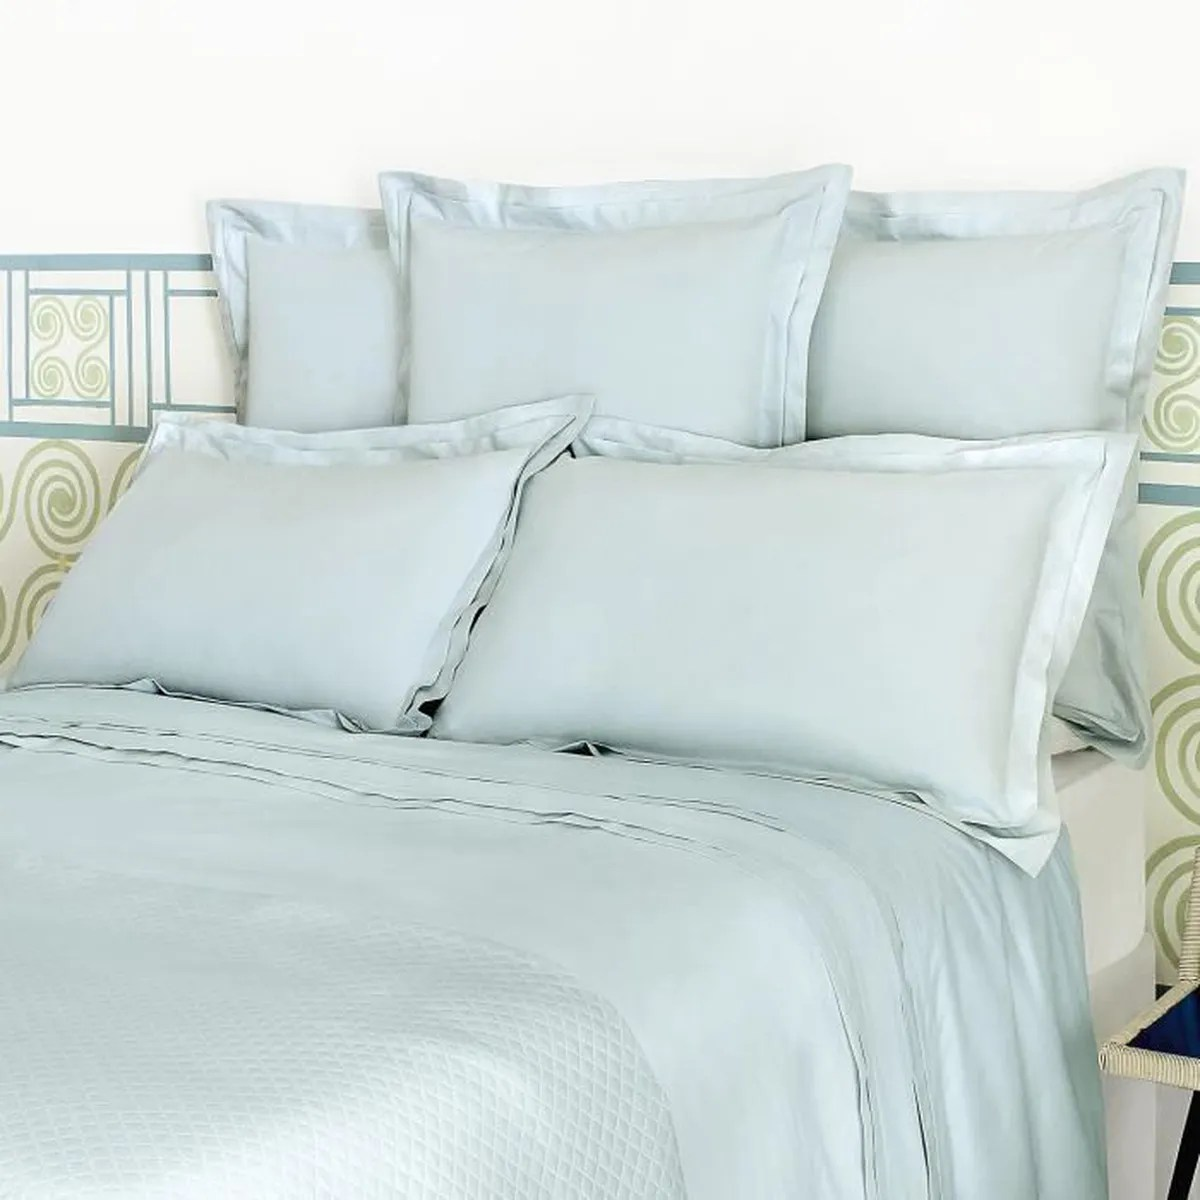 taie oreiller en soie | housse d oreiller en soie pÜr dormez vous